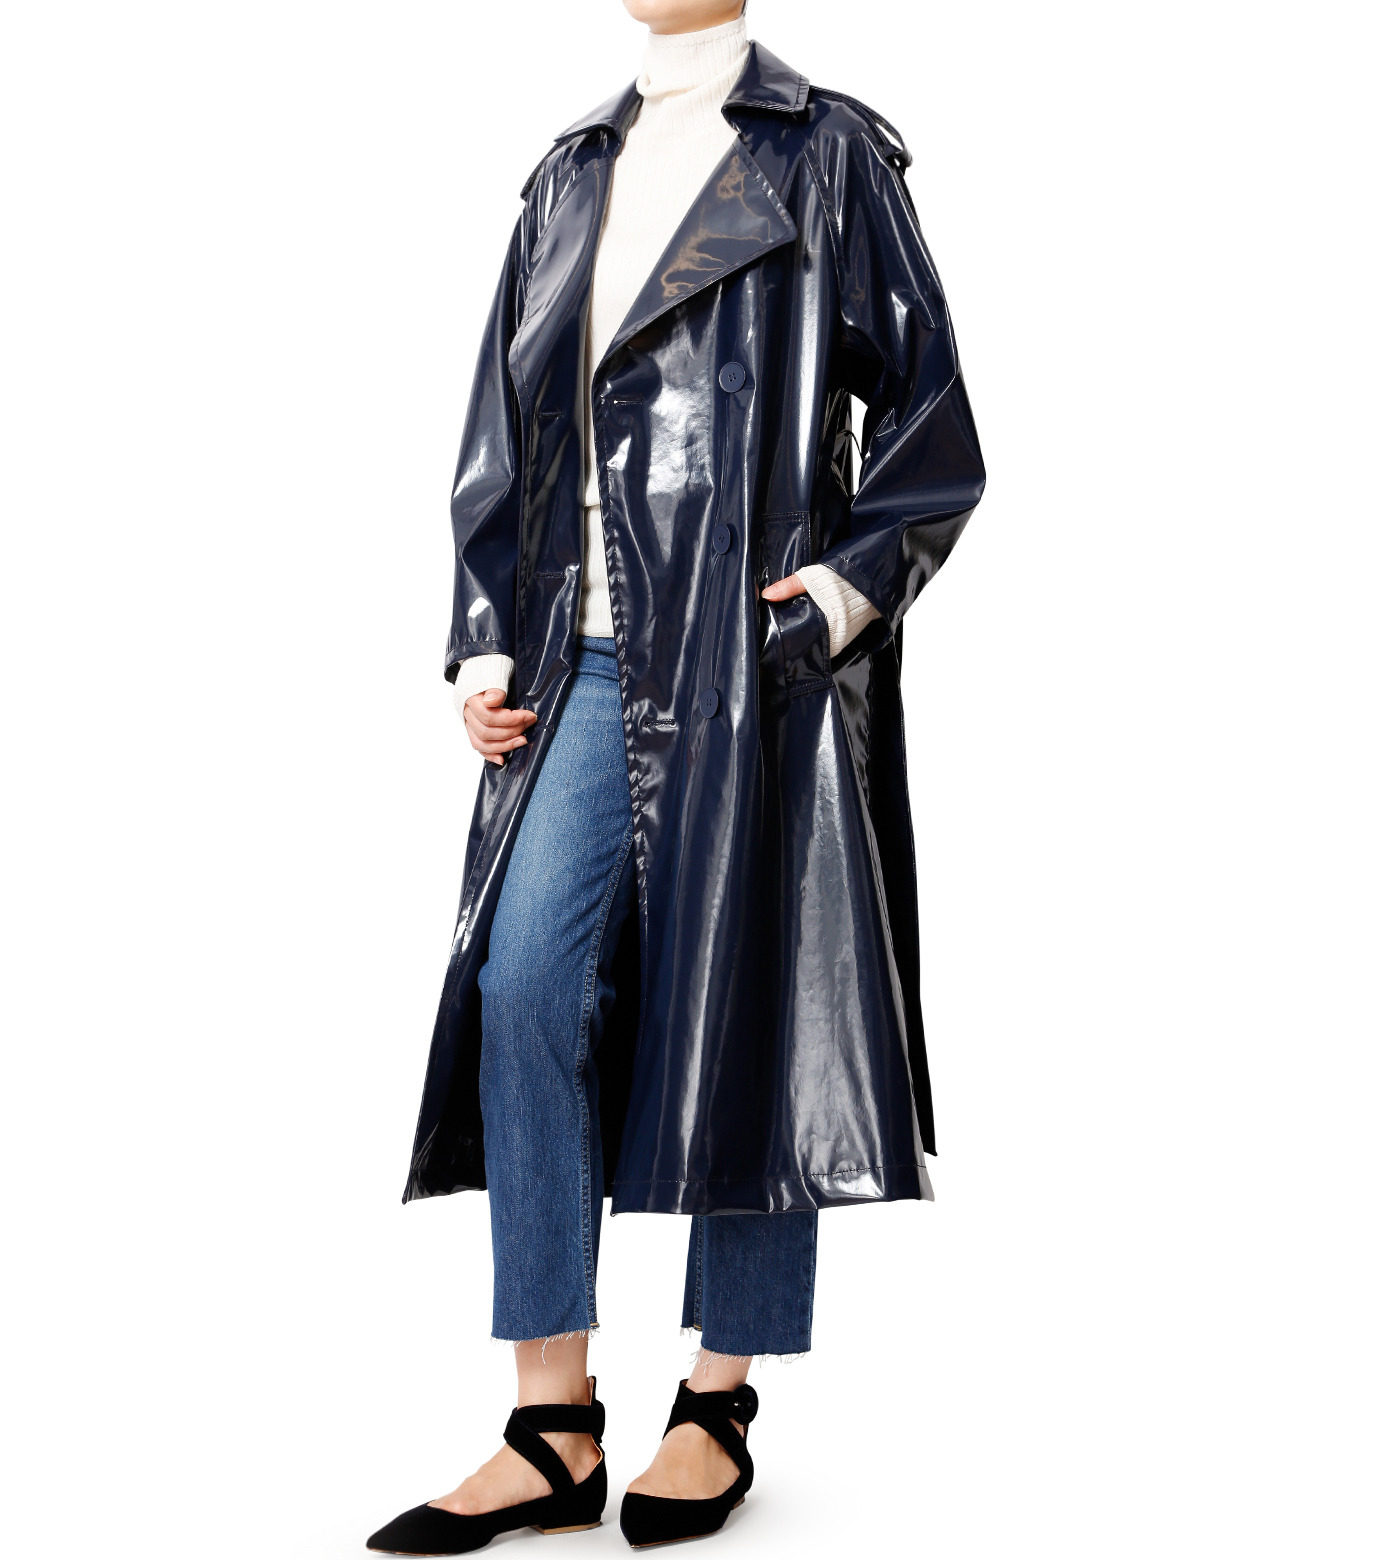 LE CIEL BLEU(ルシェルブルー)のフェイクエナメルレディトレンチコート-NAVY(コート/coat)-18A69408 拡大詳細画像3